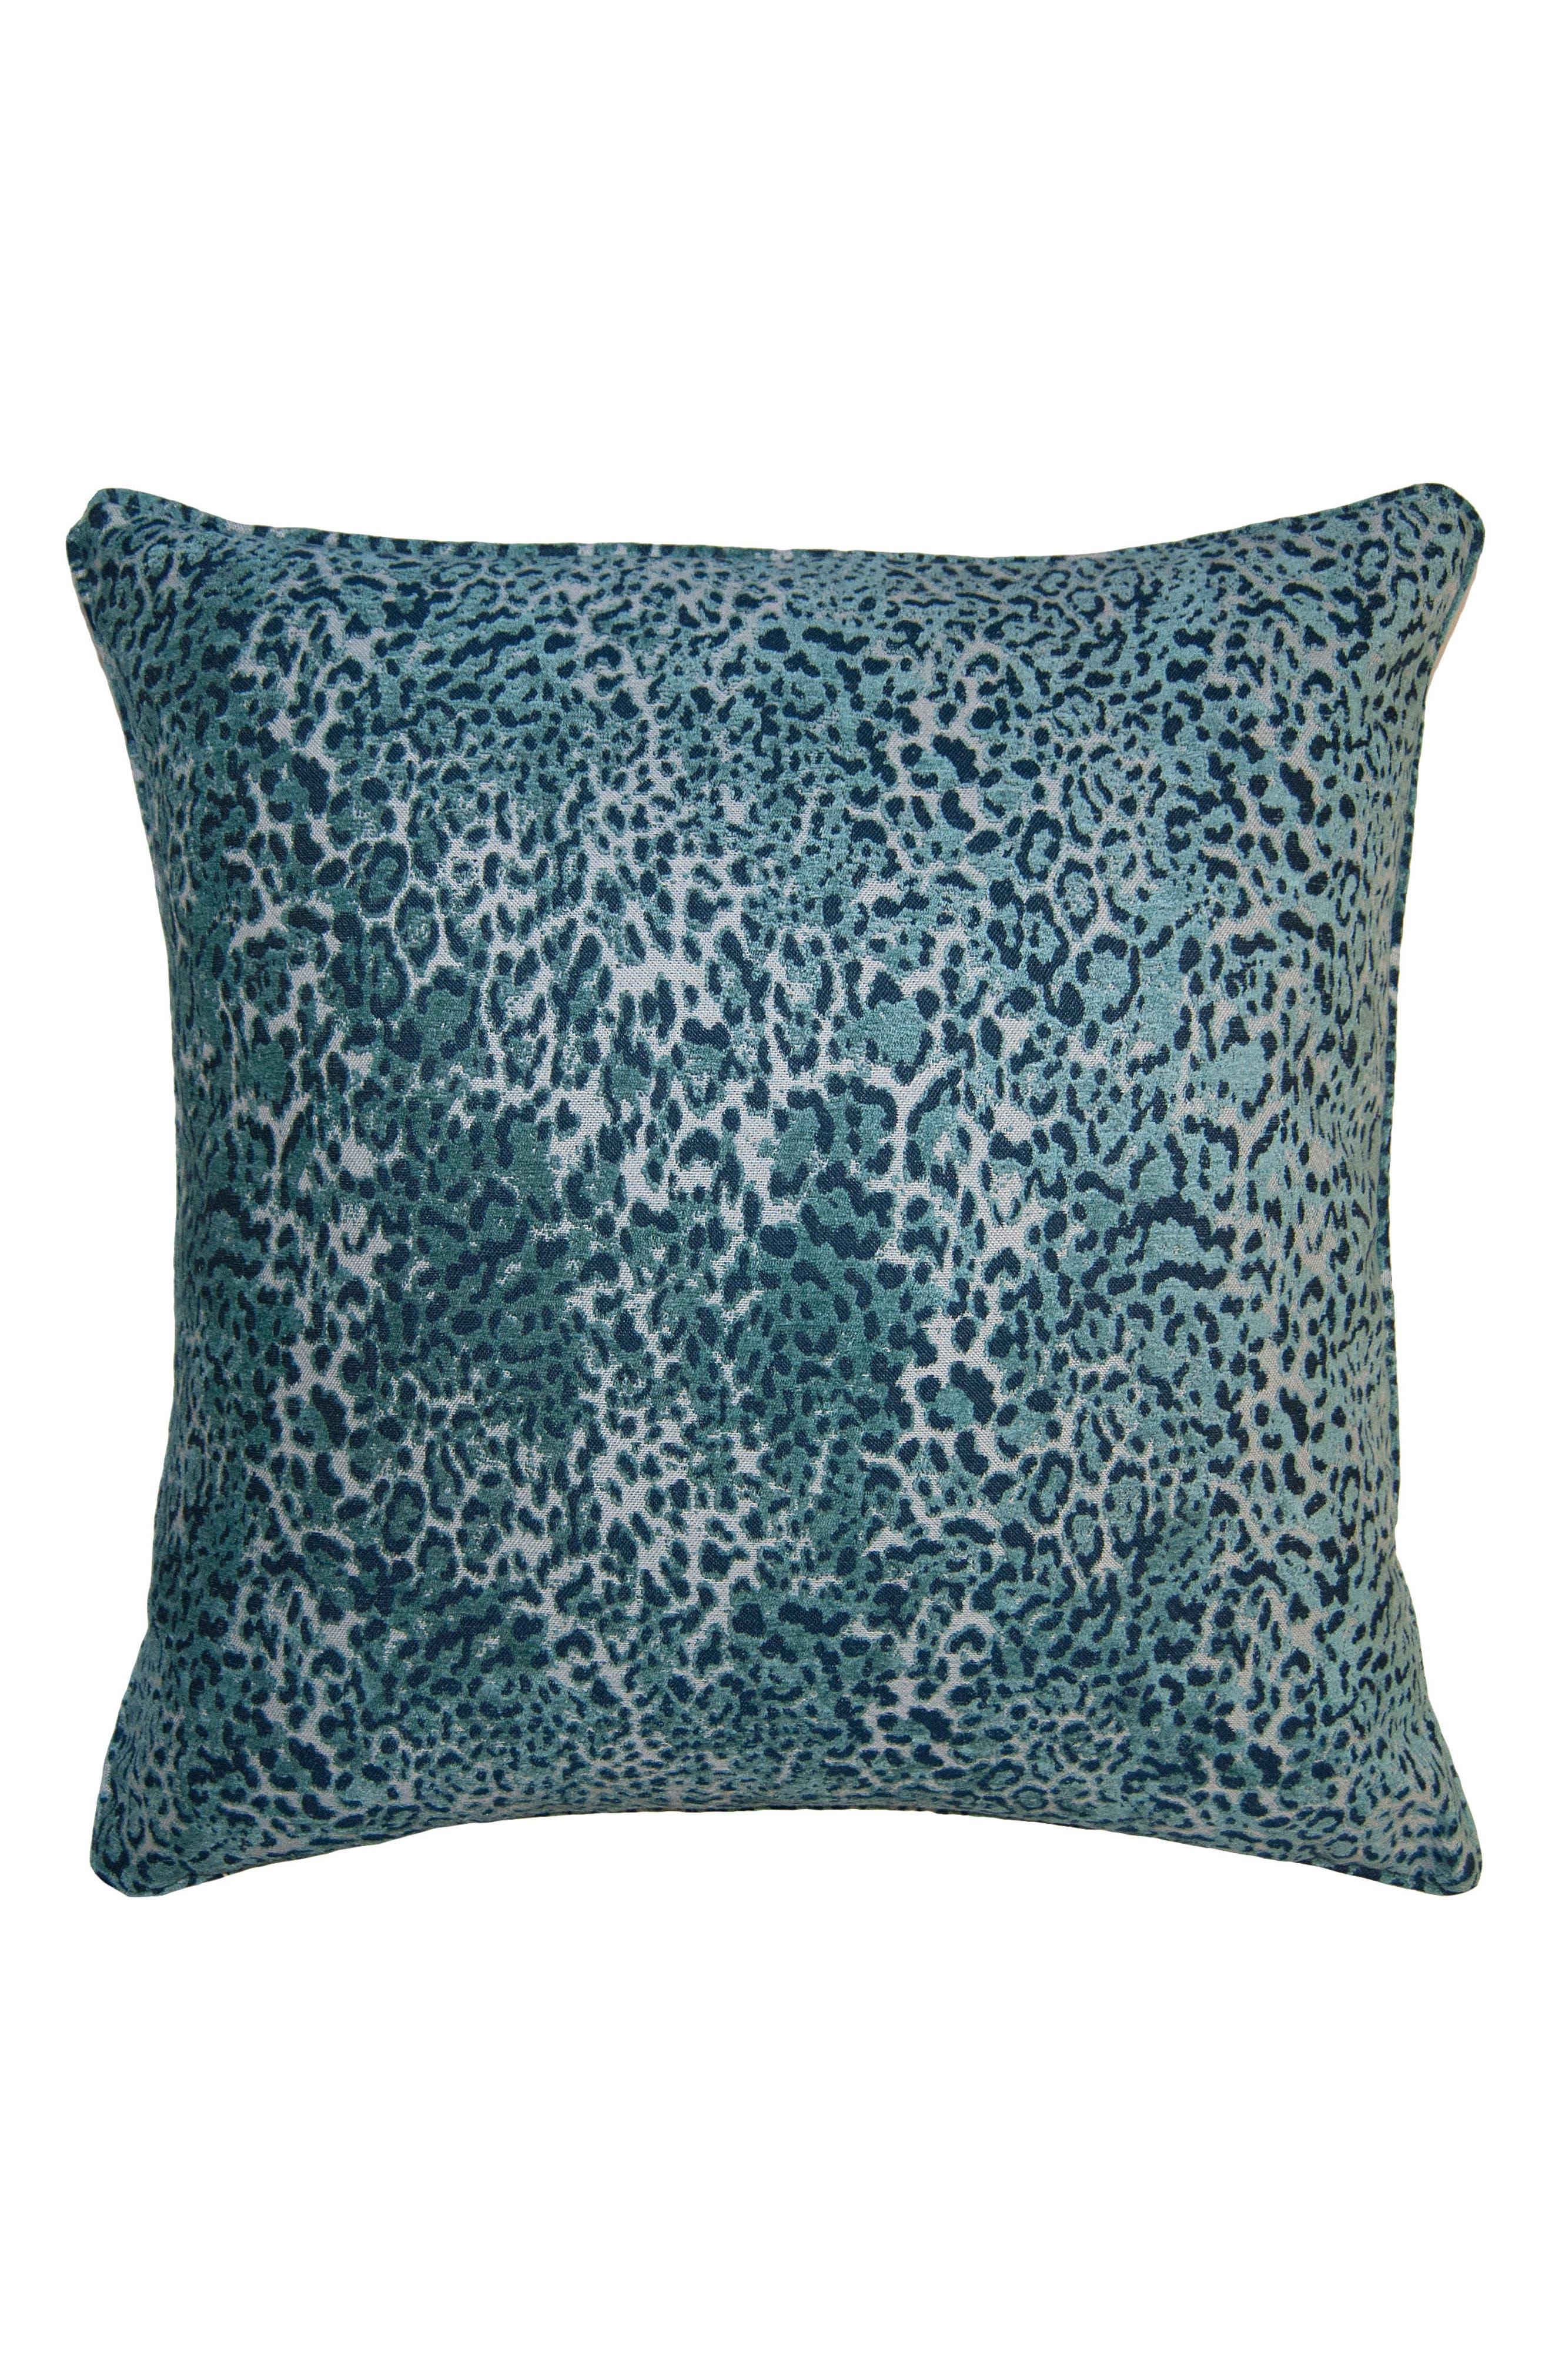 Sky Safari Accent Pillow,                             Main thumbnail 1, color,                             Blue